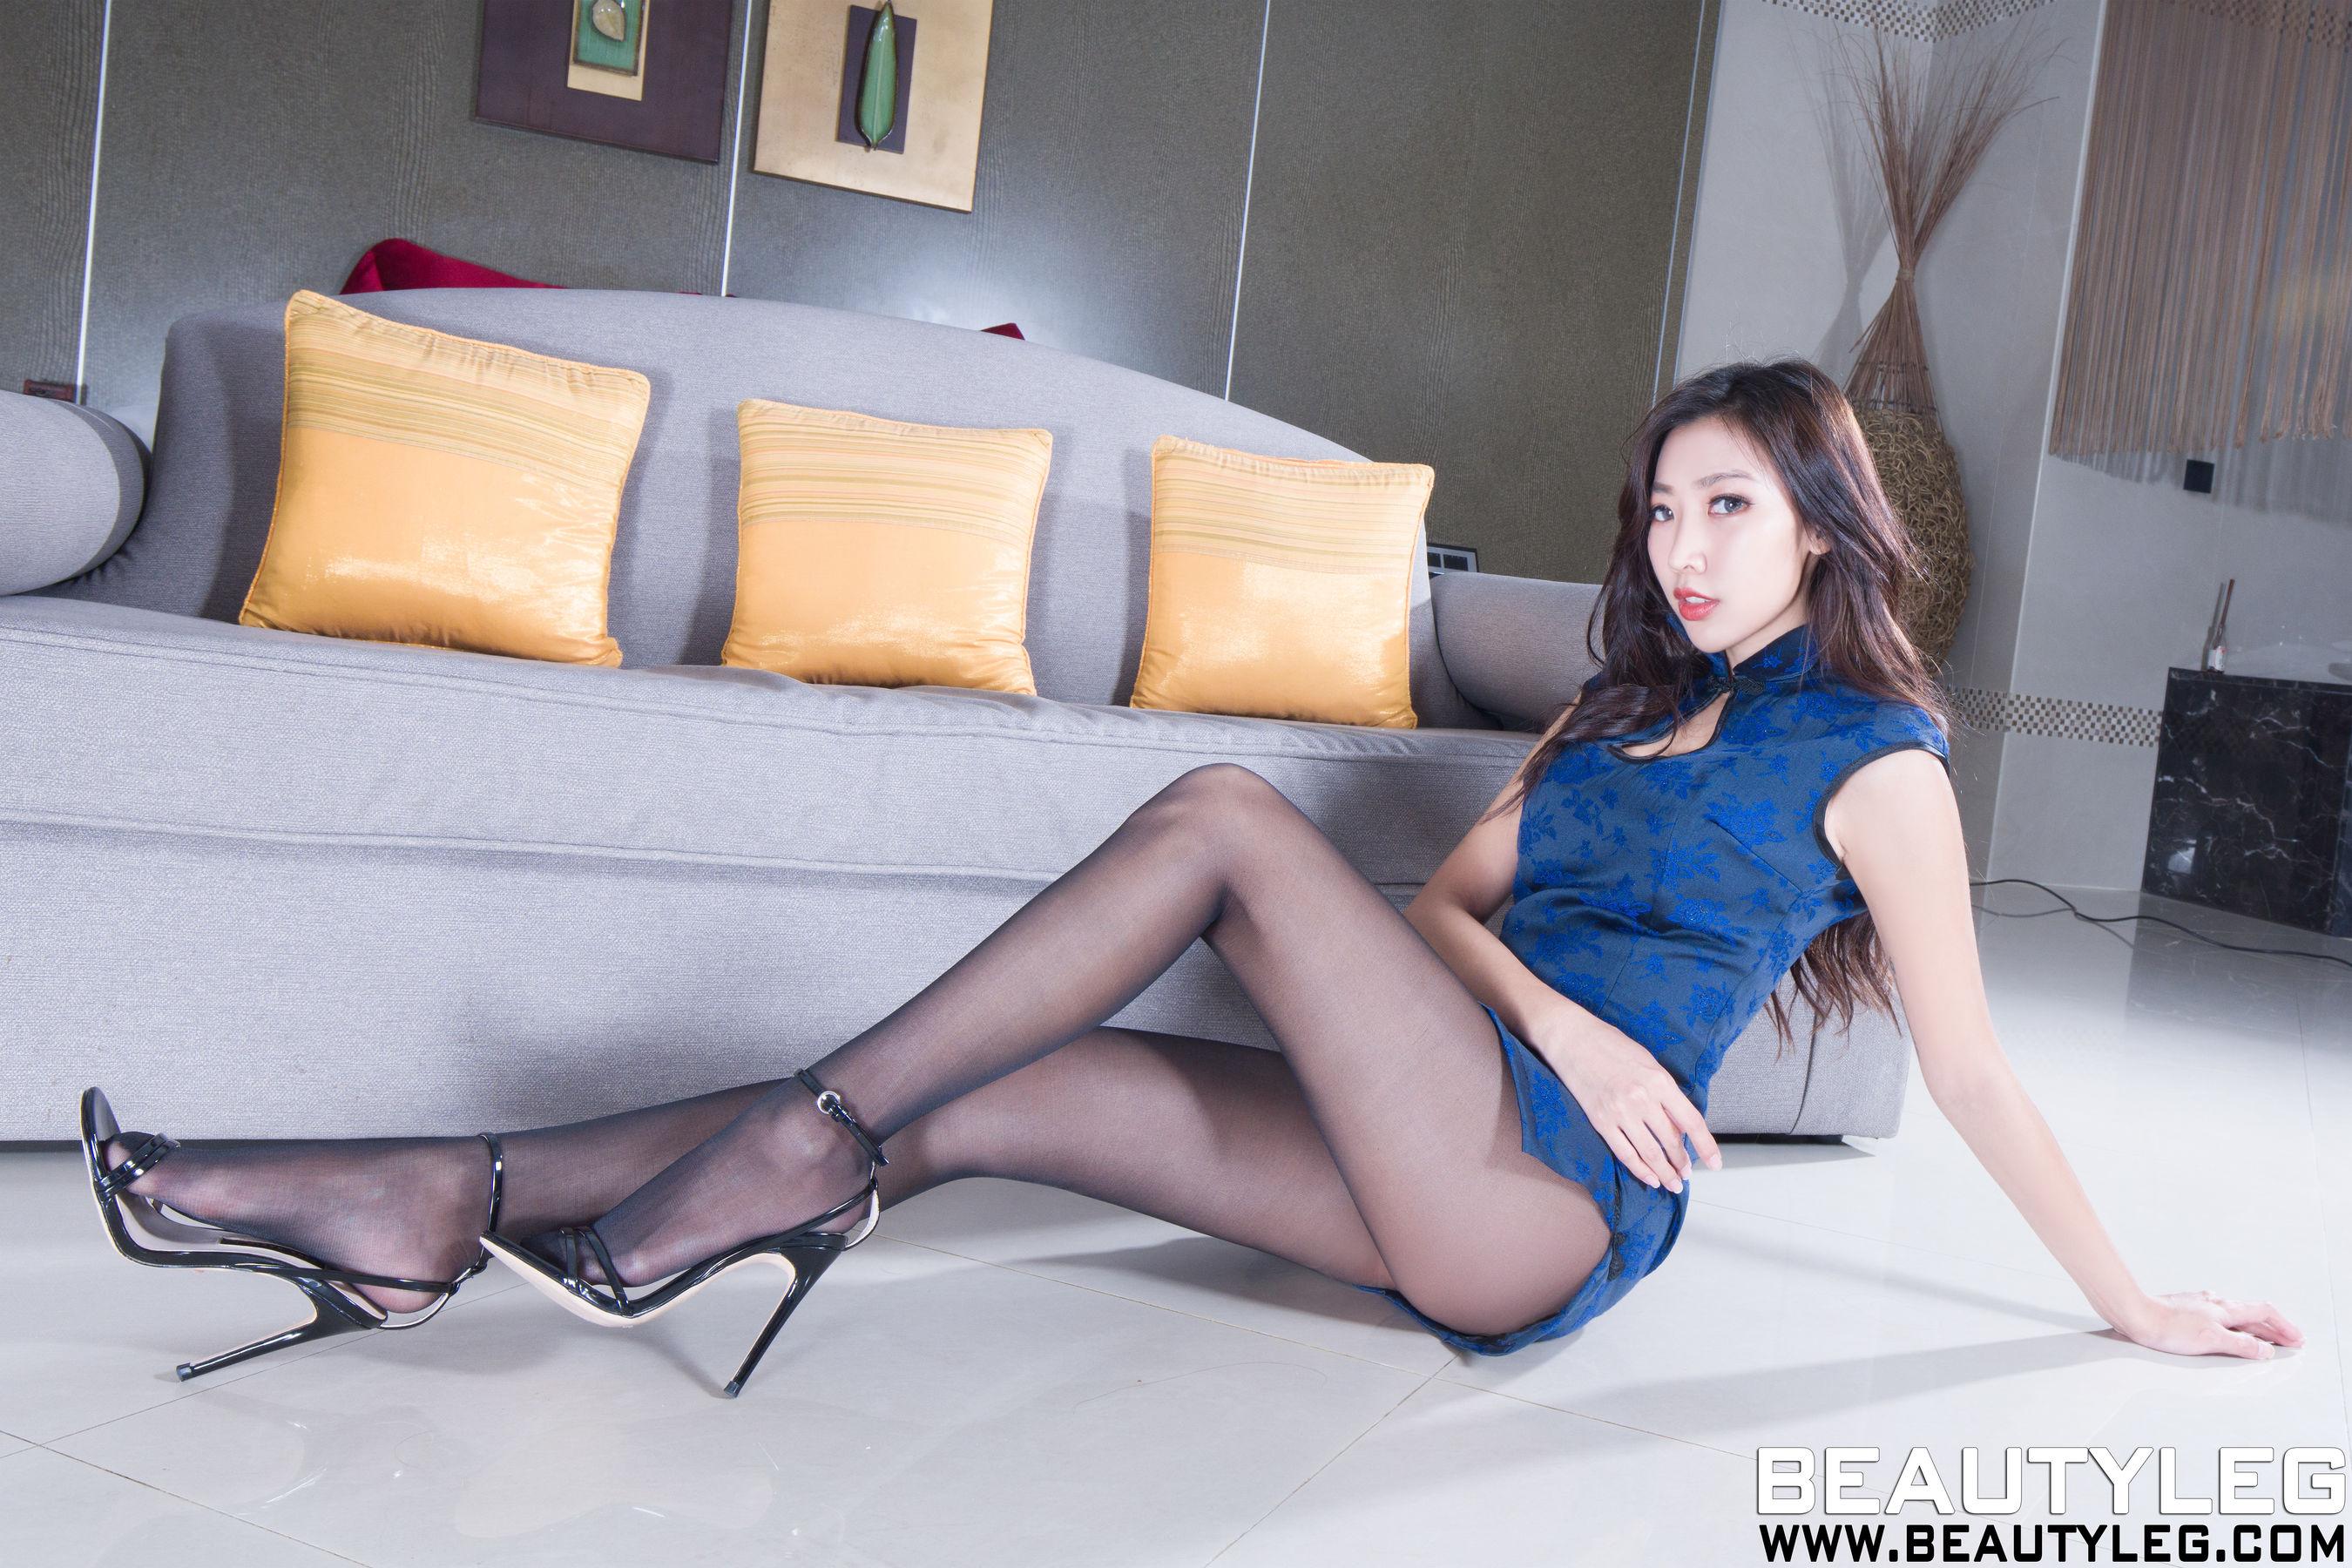 VOL.1313 [Beautyleg]美腿高跟:廖羽涵(腿模Alice)超高清个人性感漂亮大图(45P)